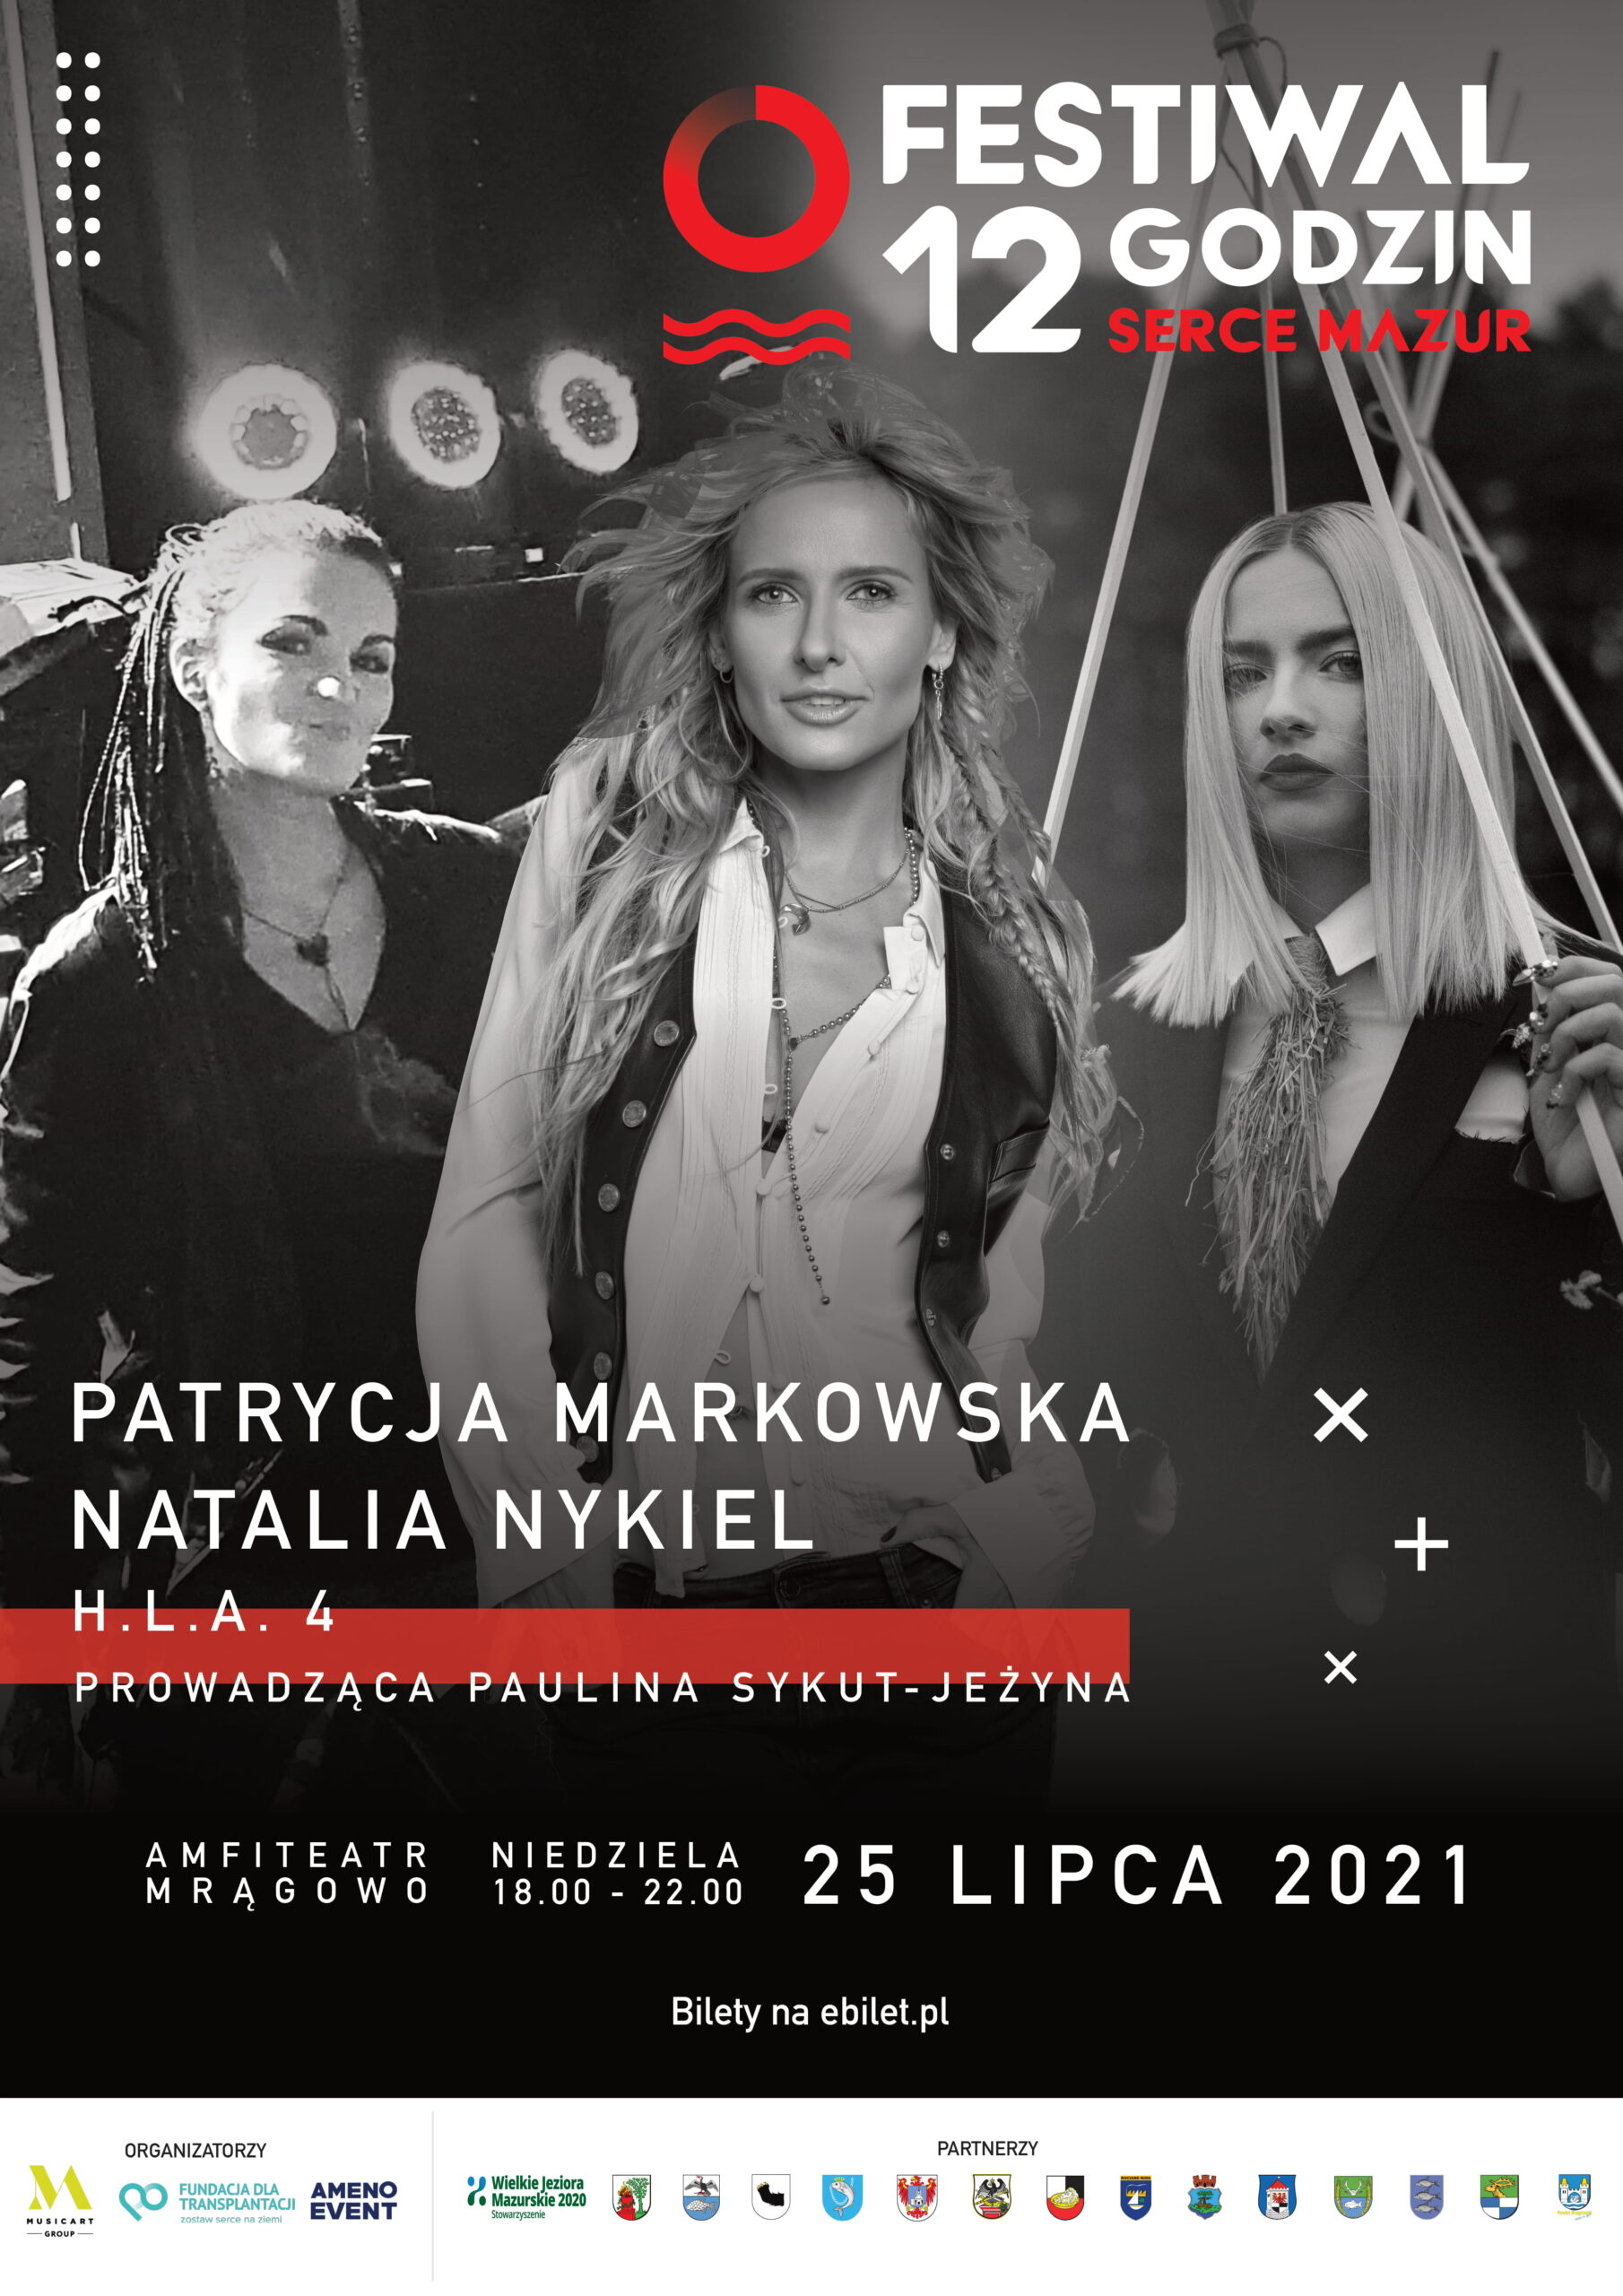 Festiwal 12 godzin Serce Mazur